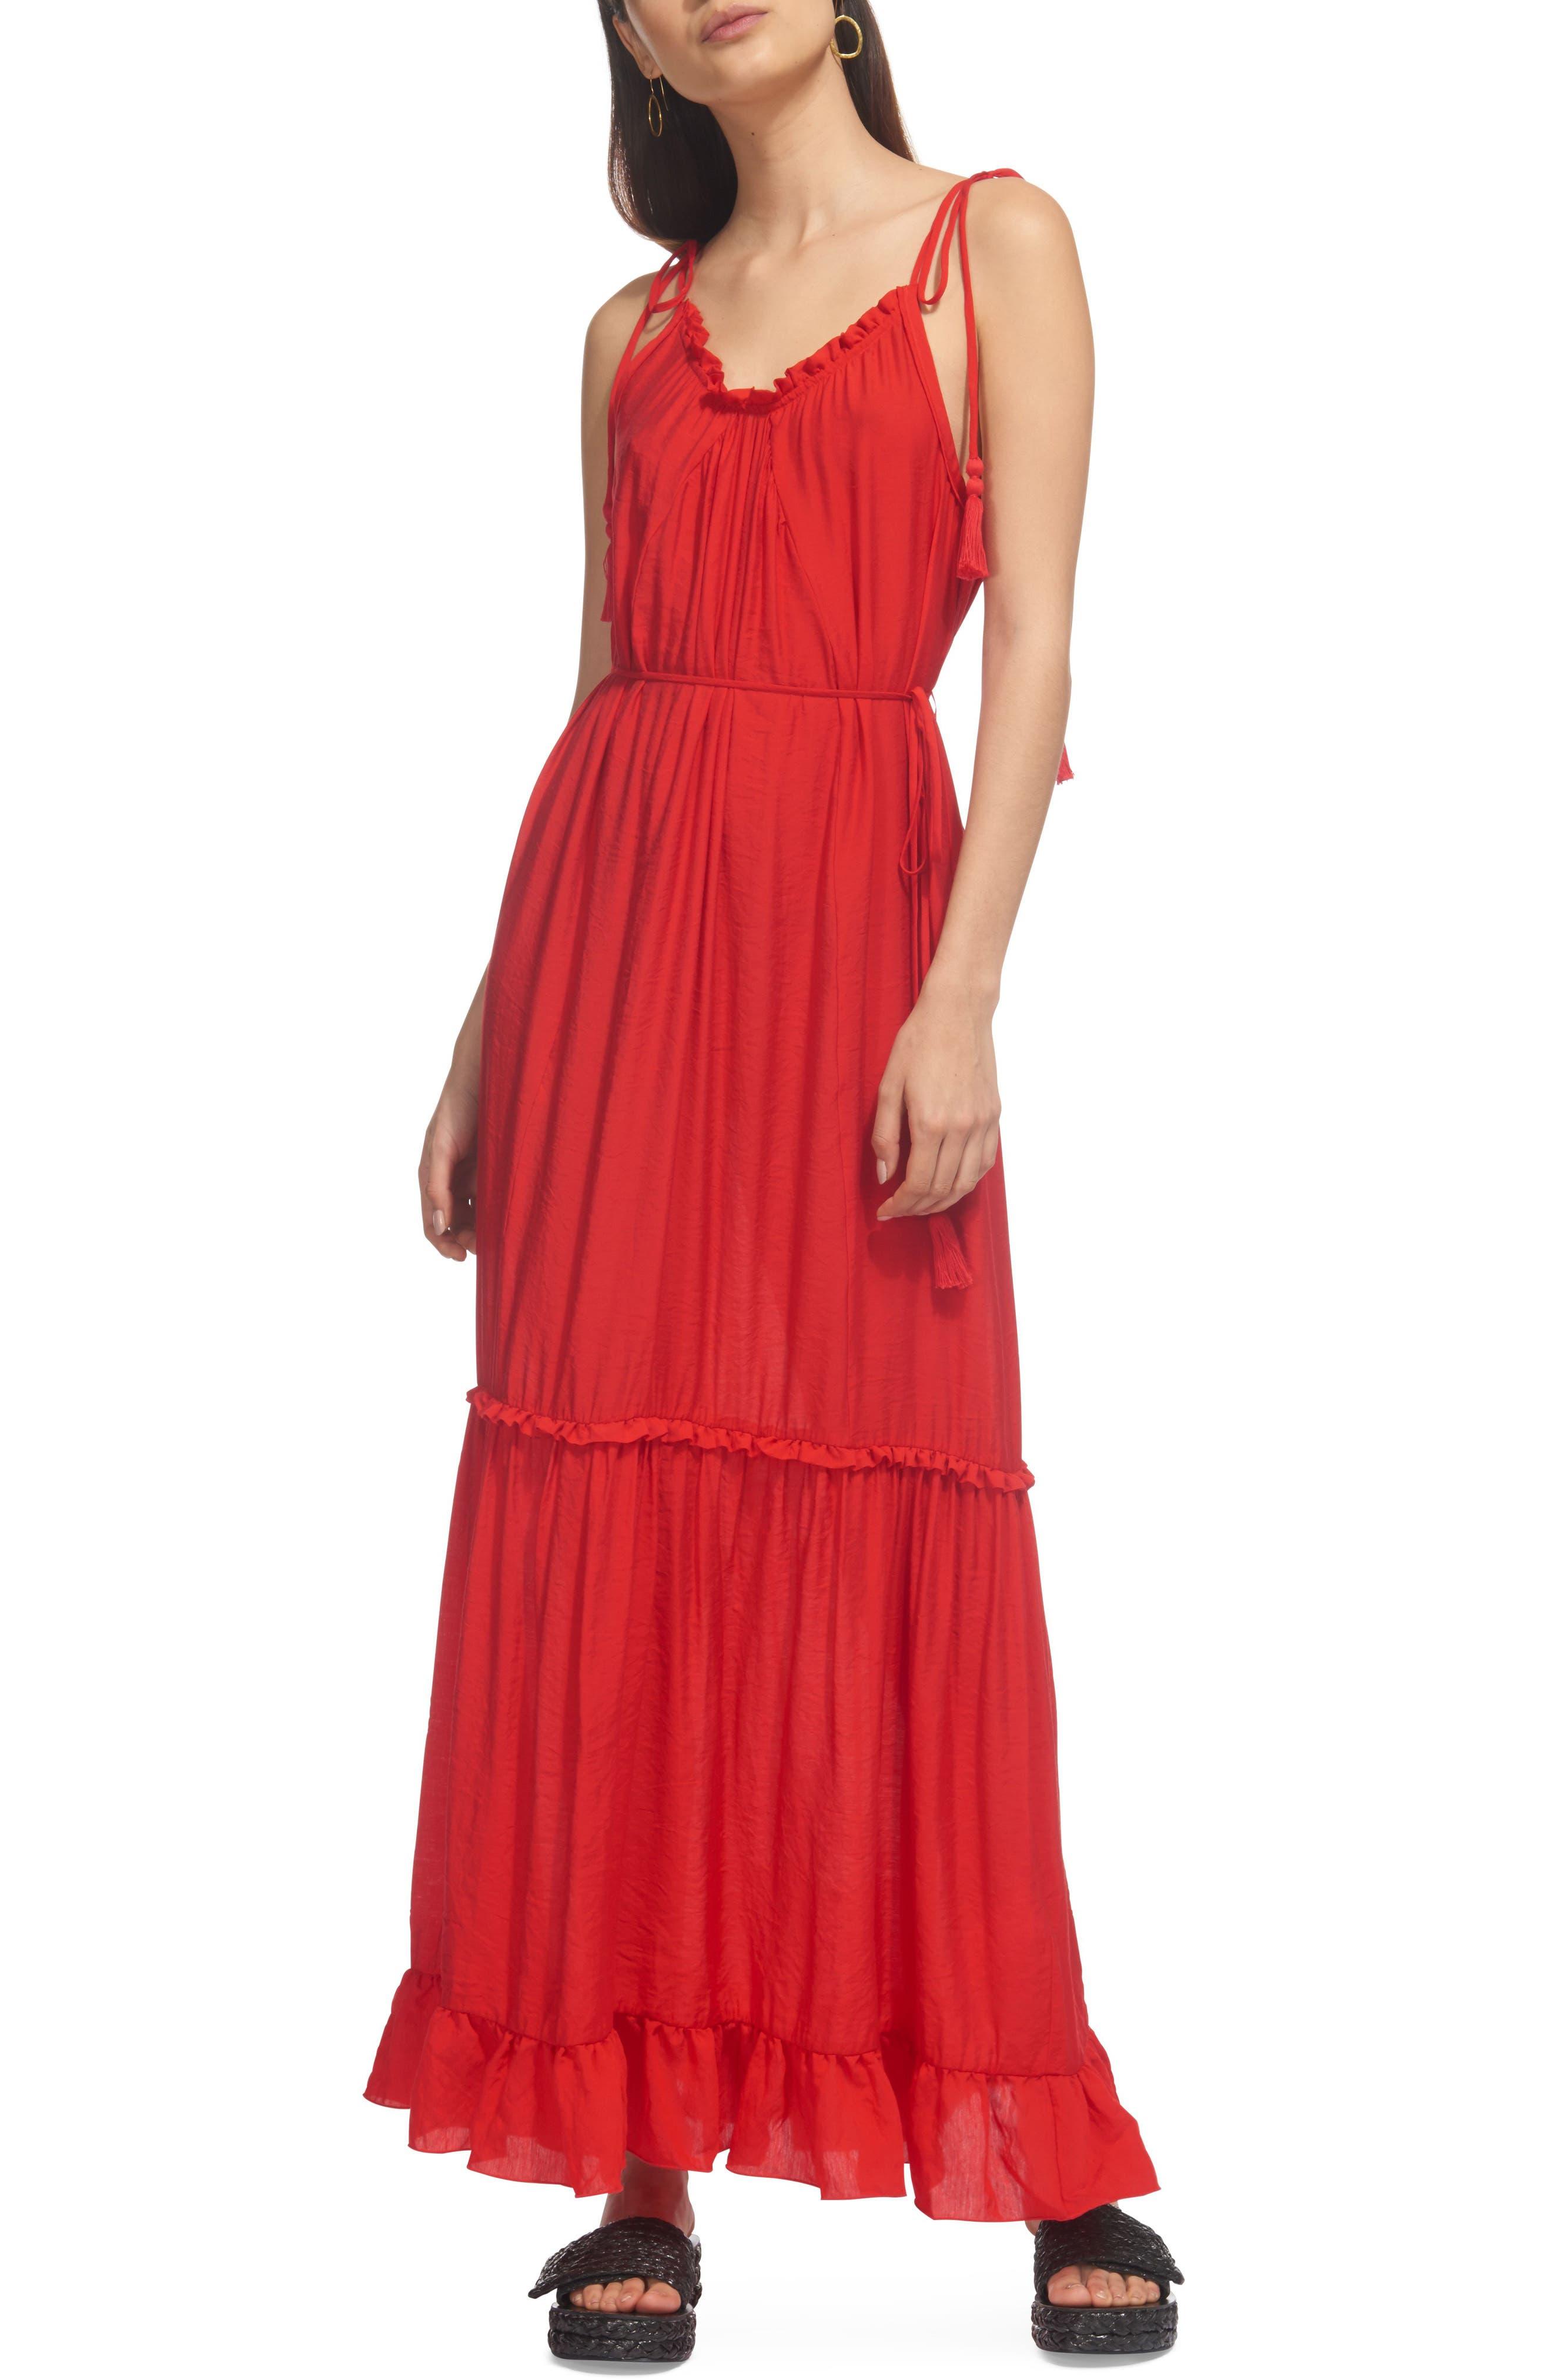 Tassel Tie Maxi Dress,                             Main thumbnail 1, color,                             Red